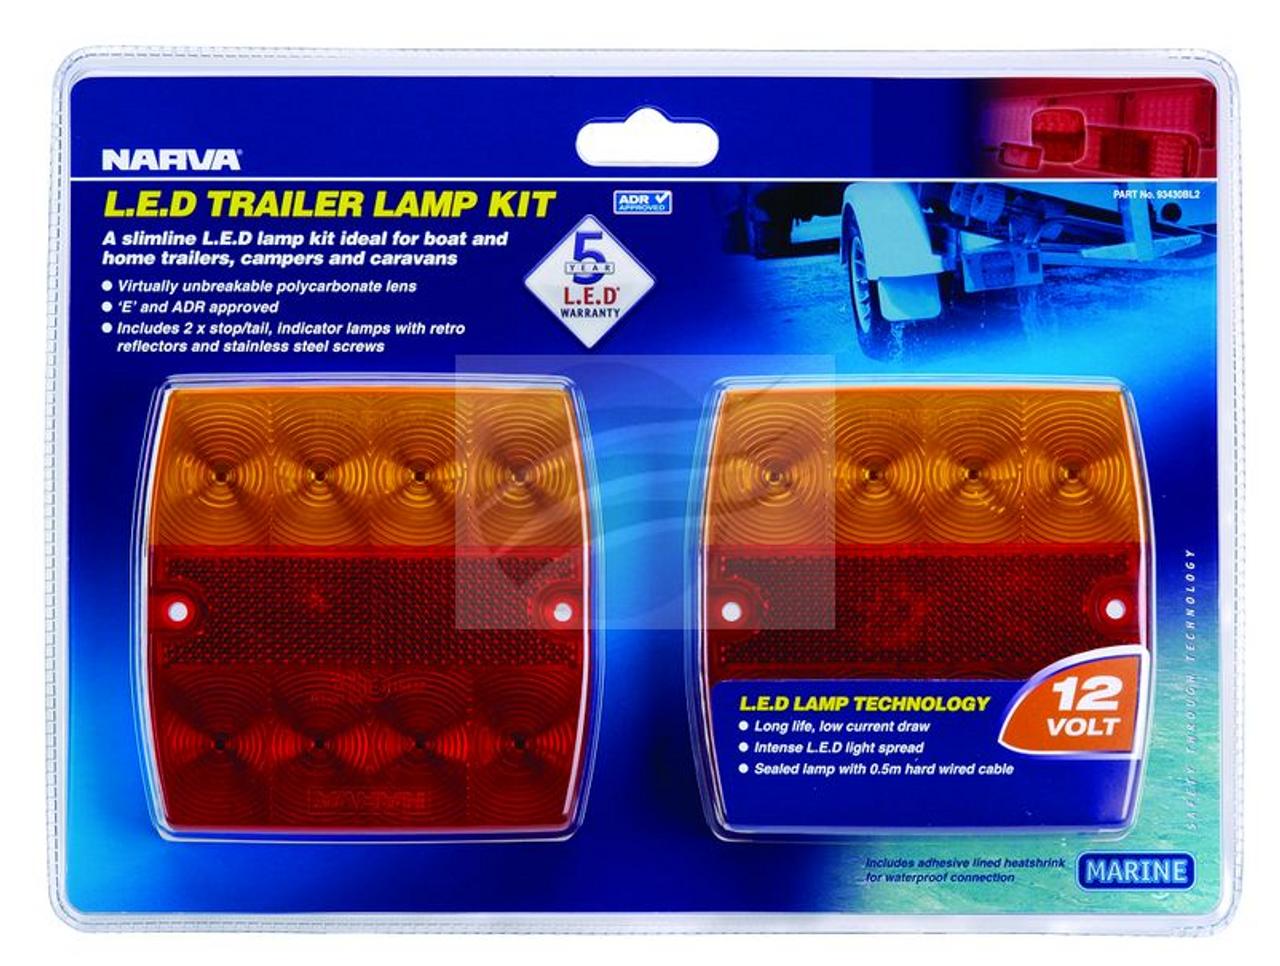 93430BL - Narva Model 34 LED Combination Stop Tail Indicator Light 12V Twin Pack. Narva. CD. Ultimate LED.